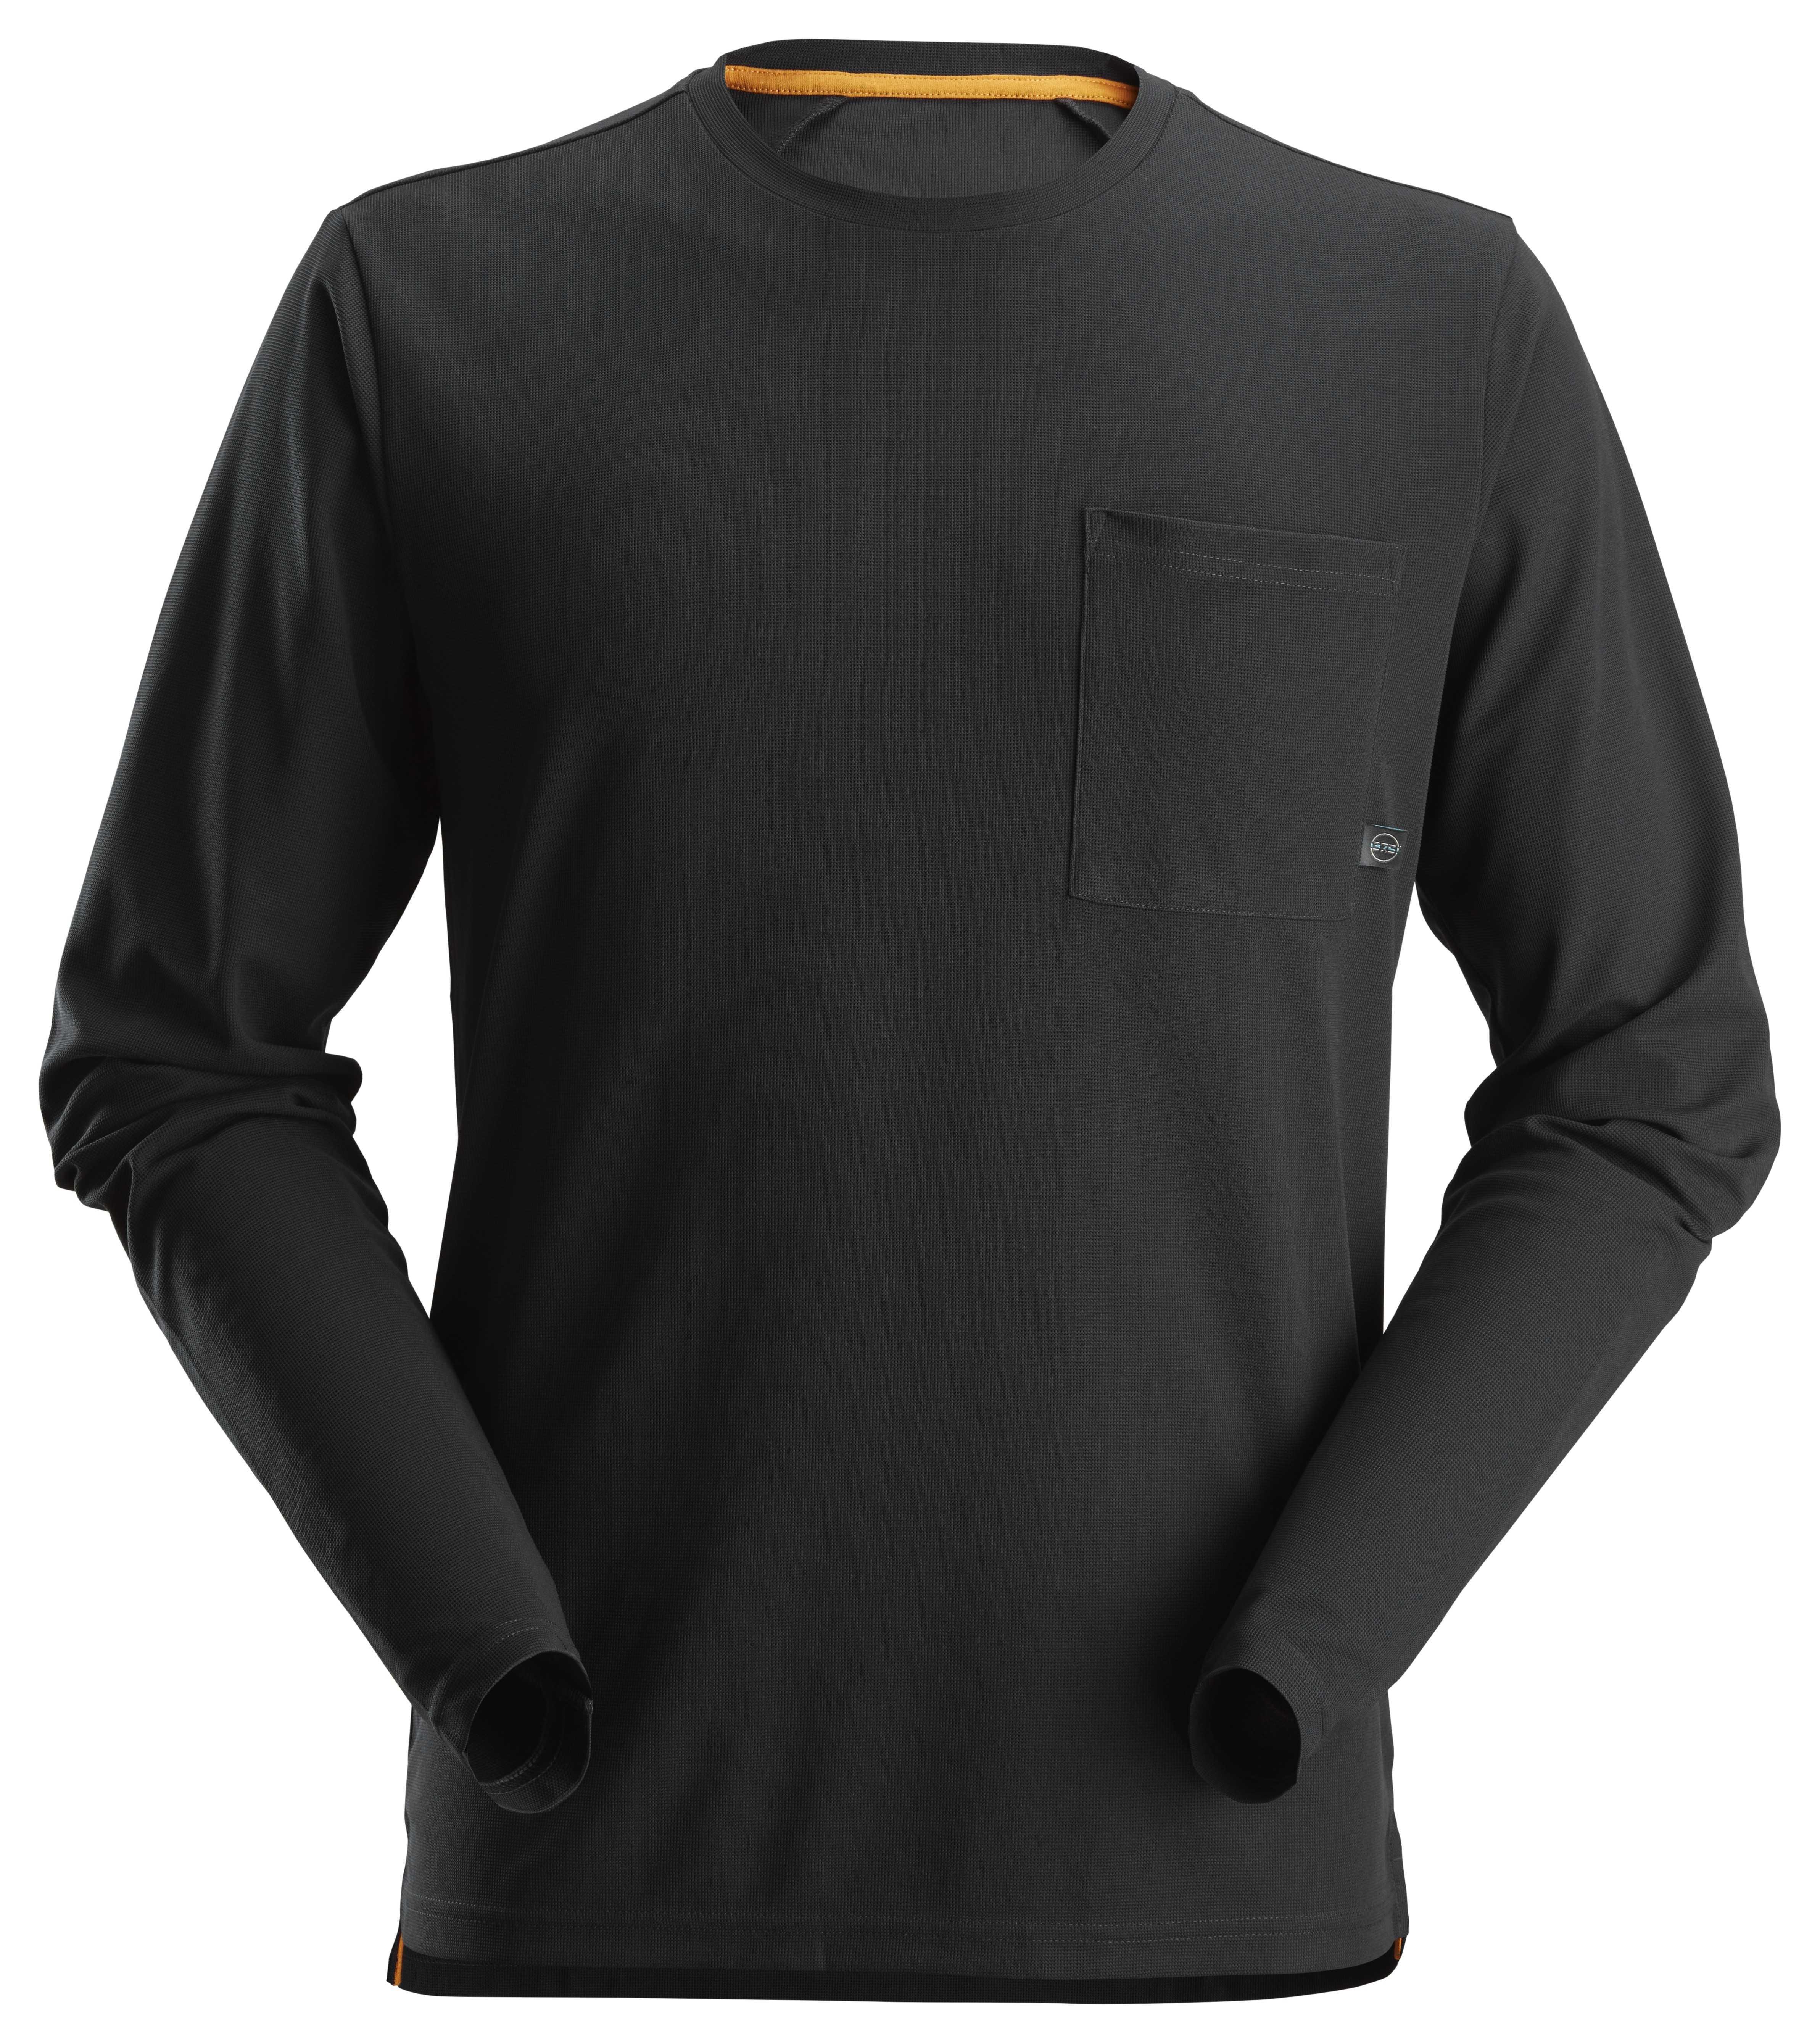 projecteur-30w-robuste-led-a-accu-brennenstuhl.jpg